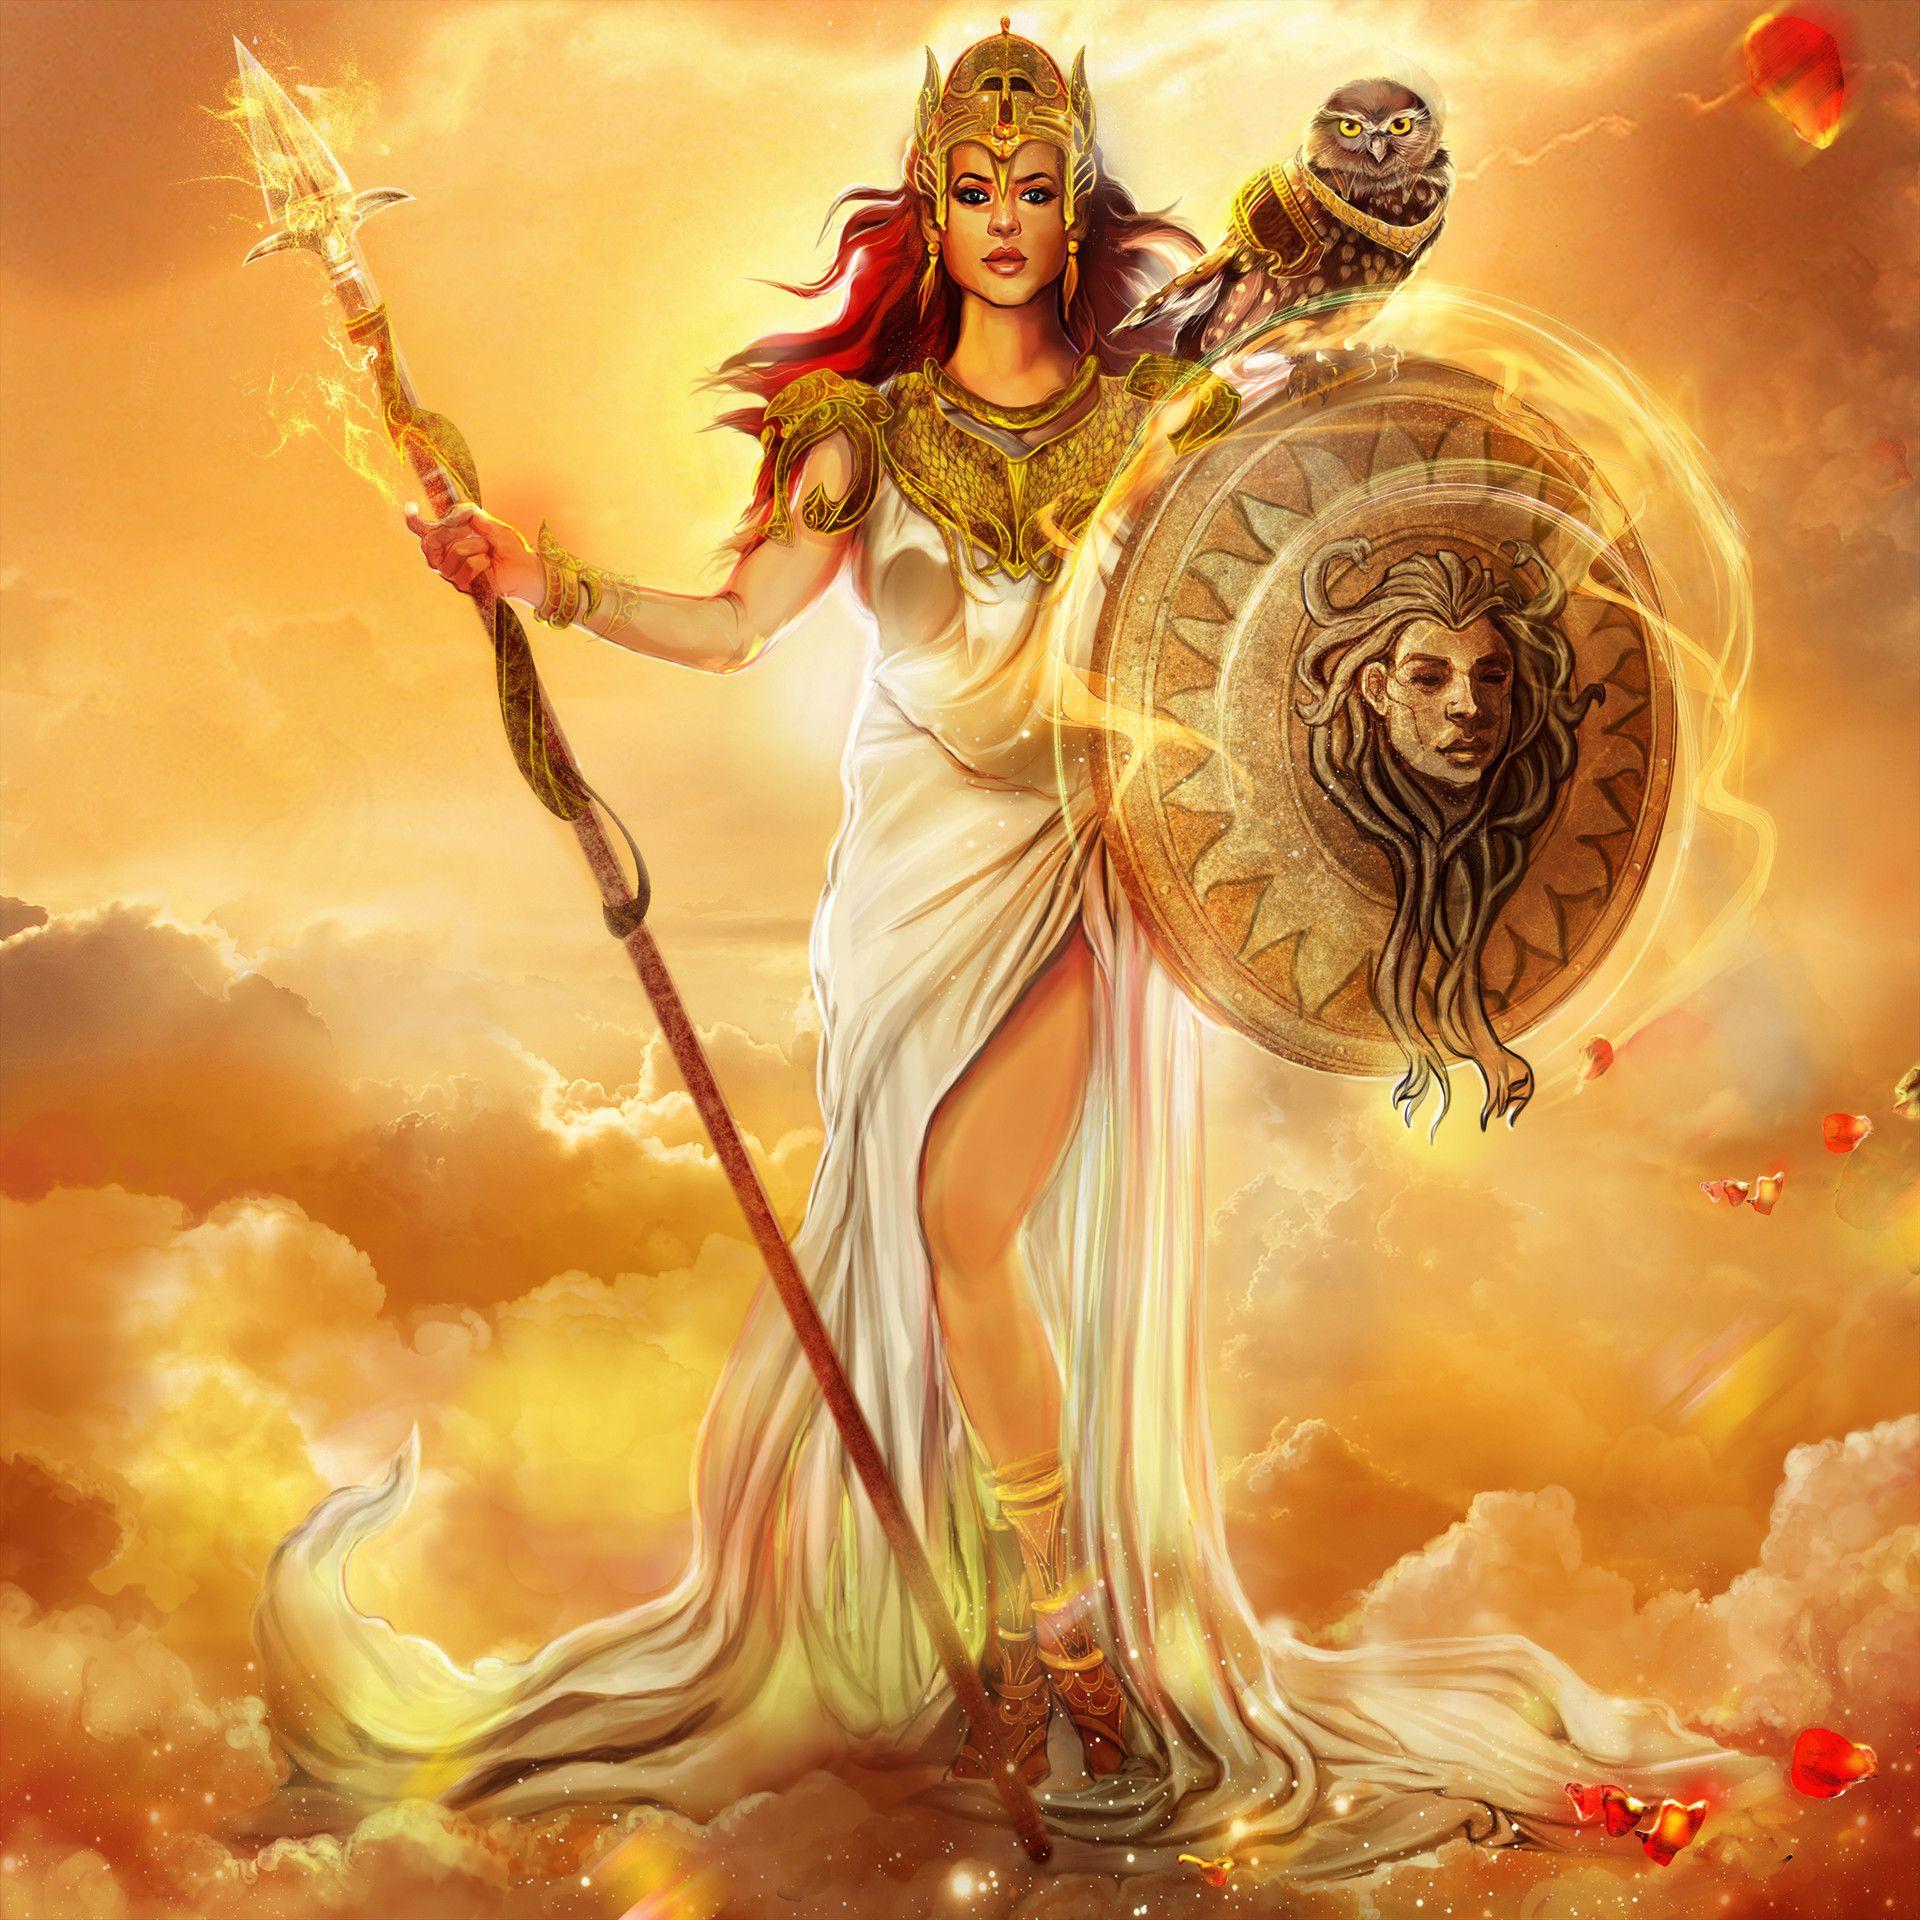 Pin by Carlie Feeney on Leg ideas in 2019   Athena goddess ...